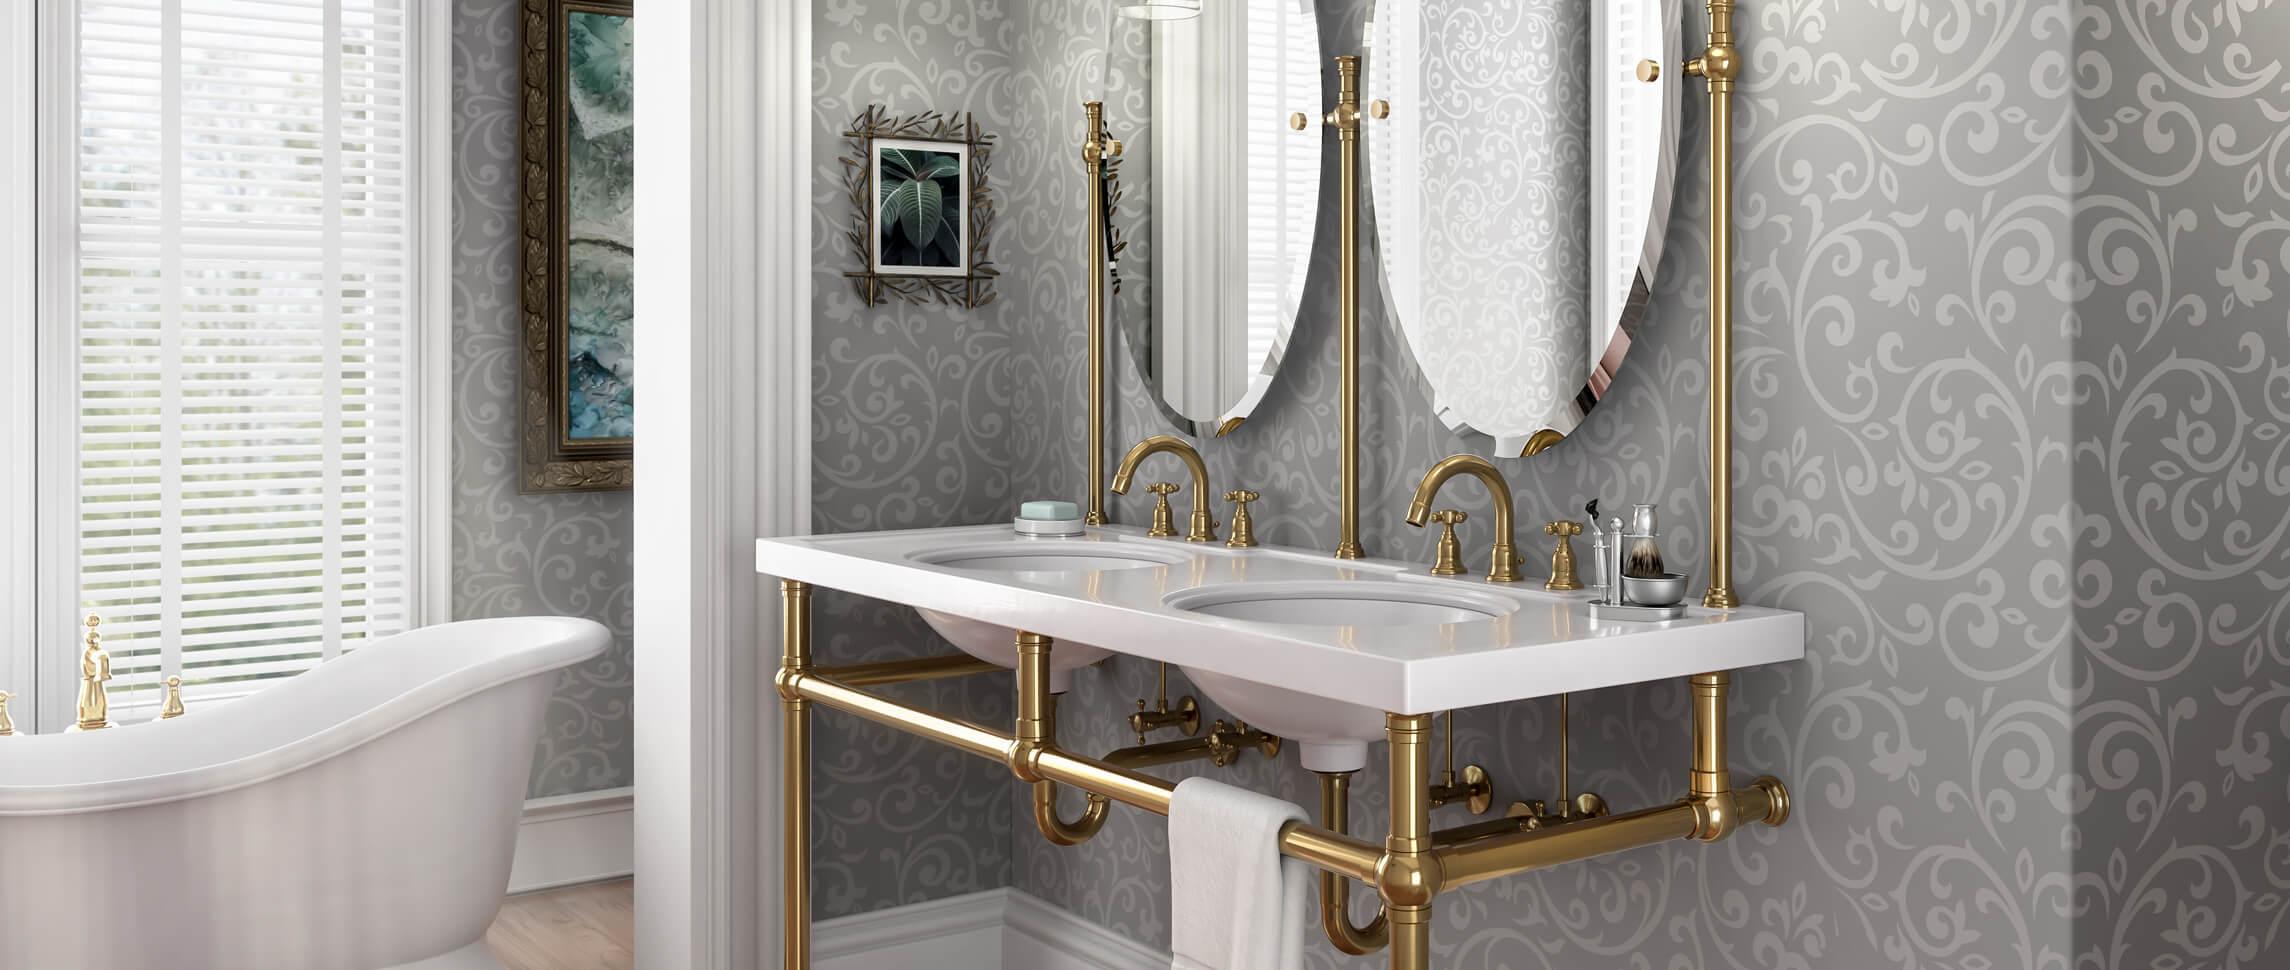 Custom Sink Leg Solutions Palmer Industries Bathroom Parts Diagram Plumbing Installation Diagrams R Bun Foot Style Brass Legs With Mirrors